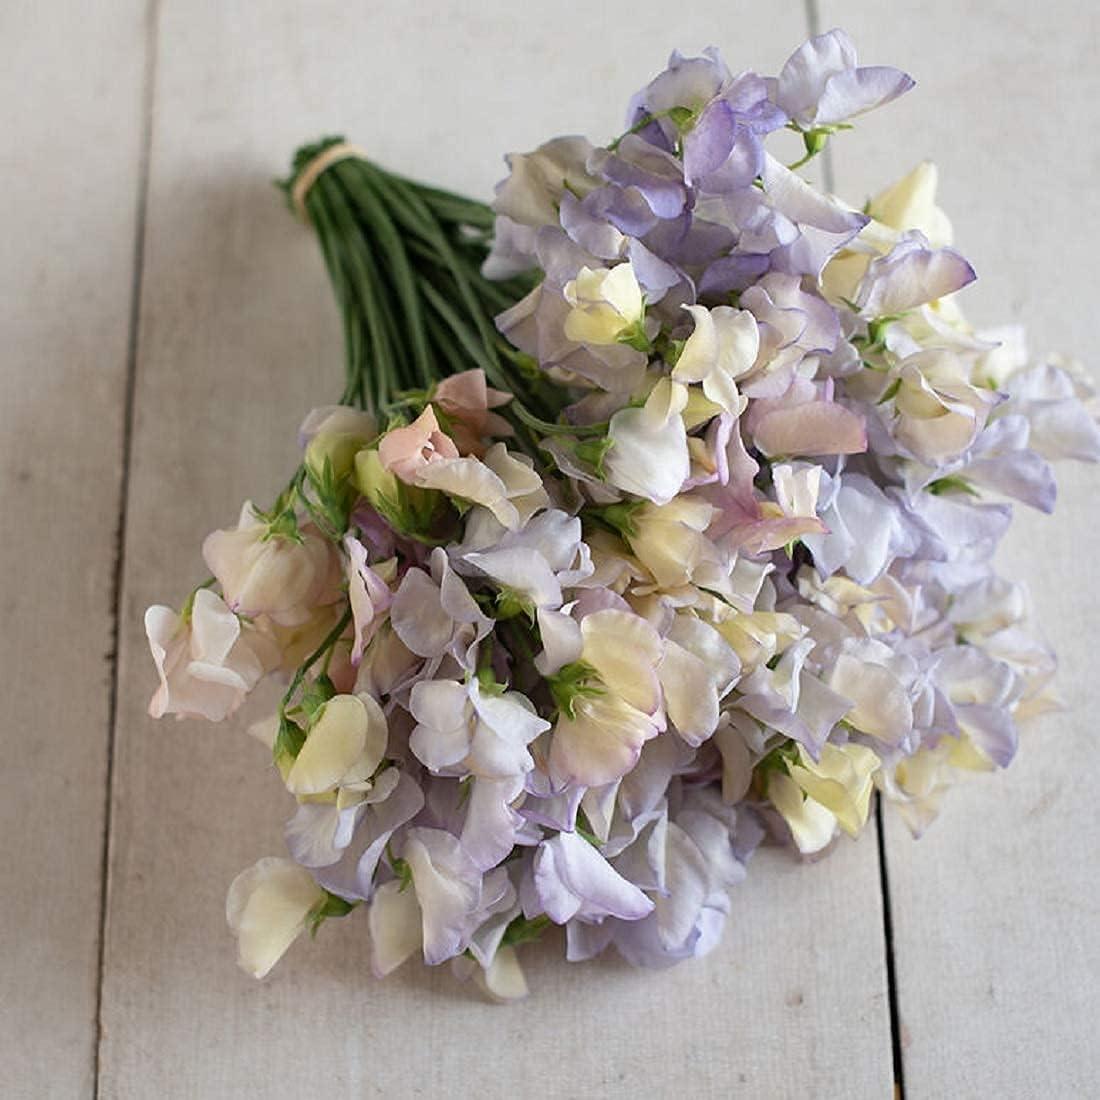 25% OFF David's Max 78% OFF Garden Seeds Flower Sweet Pea N Times 50 SAL Old Multi